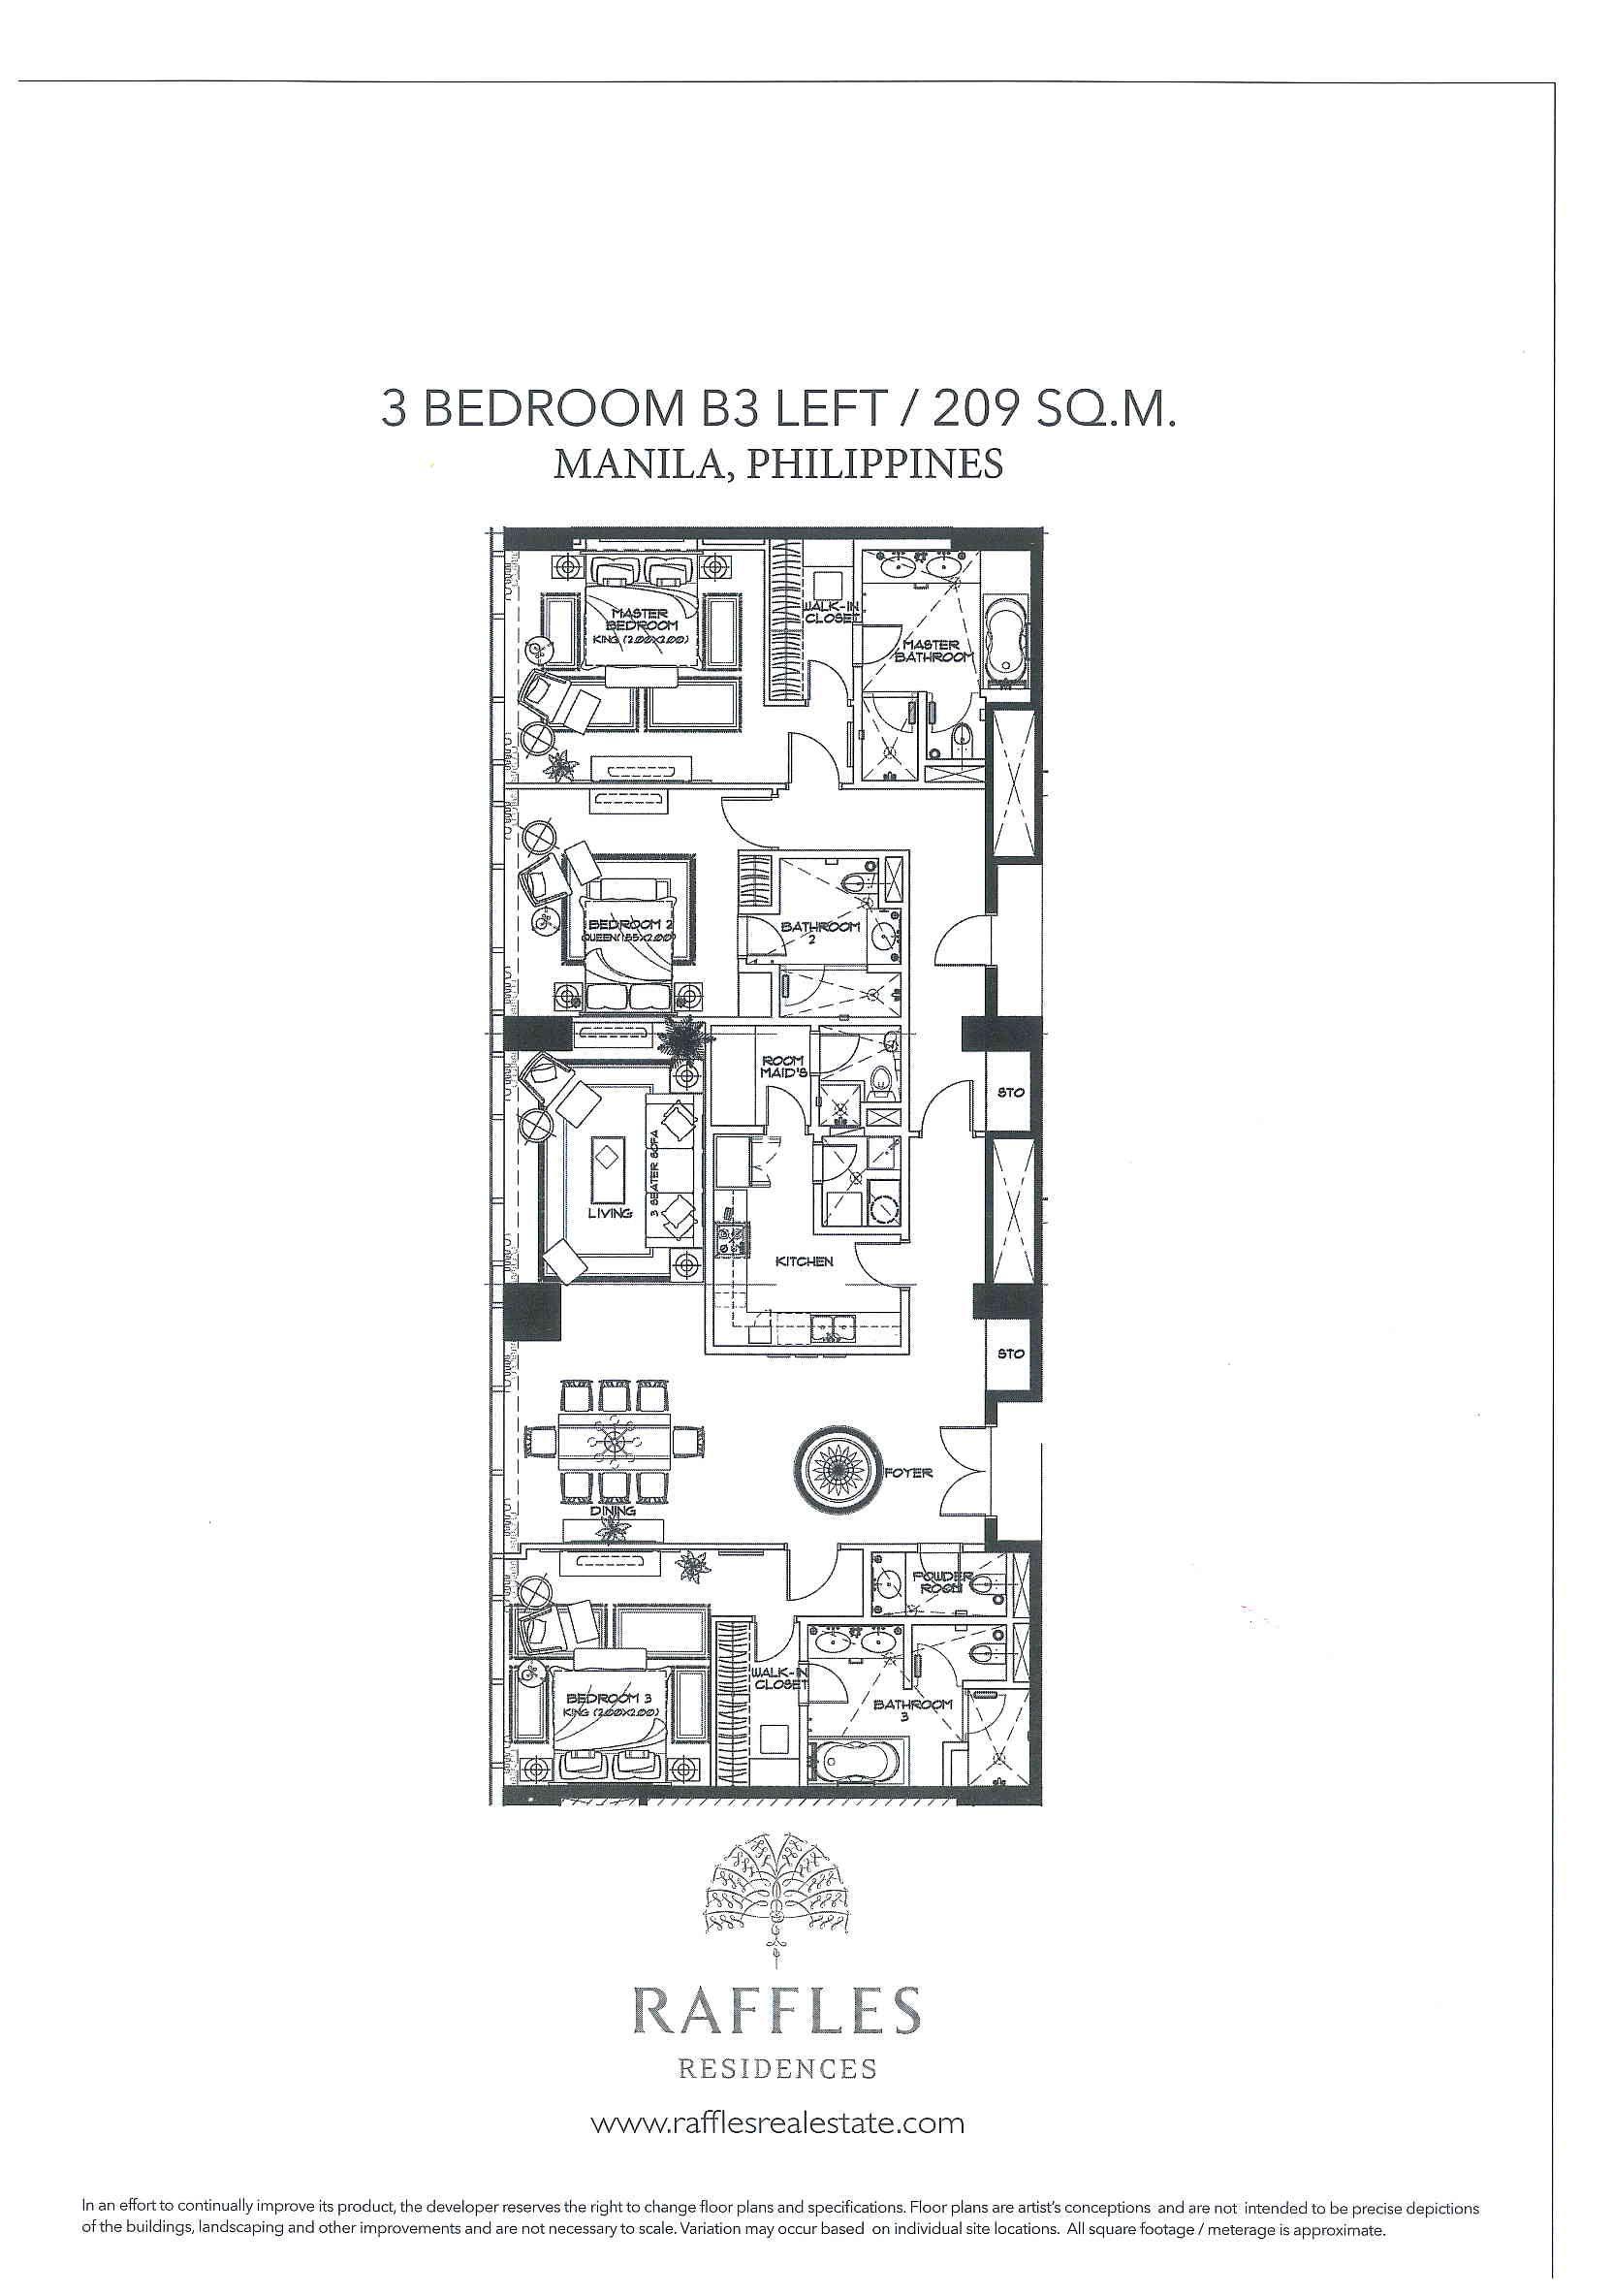 Raffles Residences Makati Apartamento